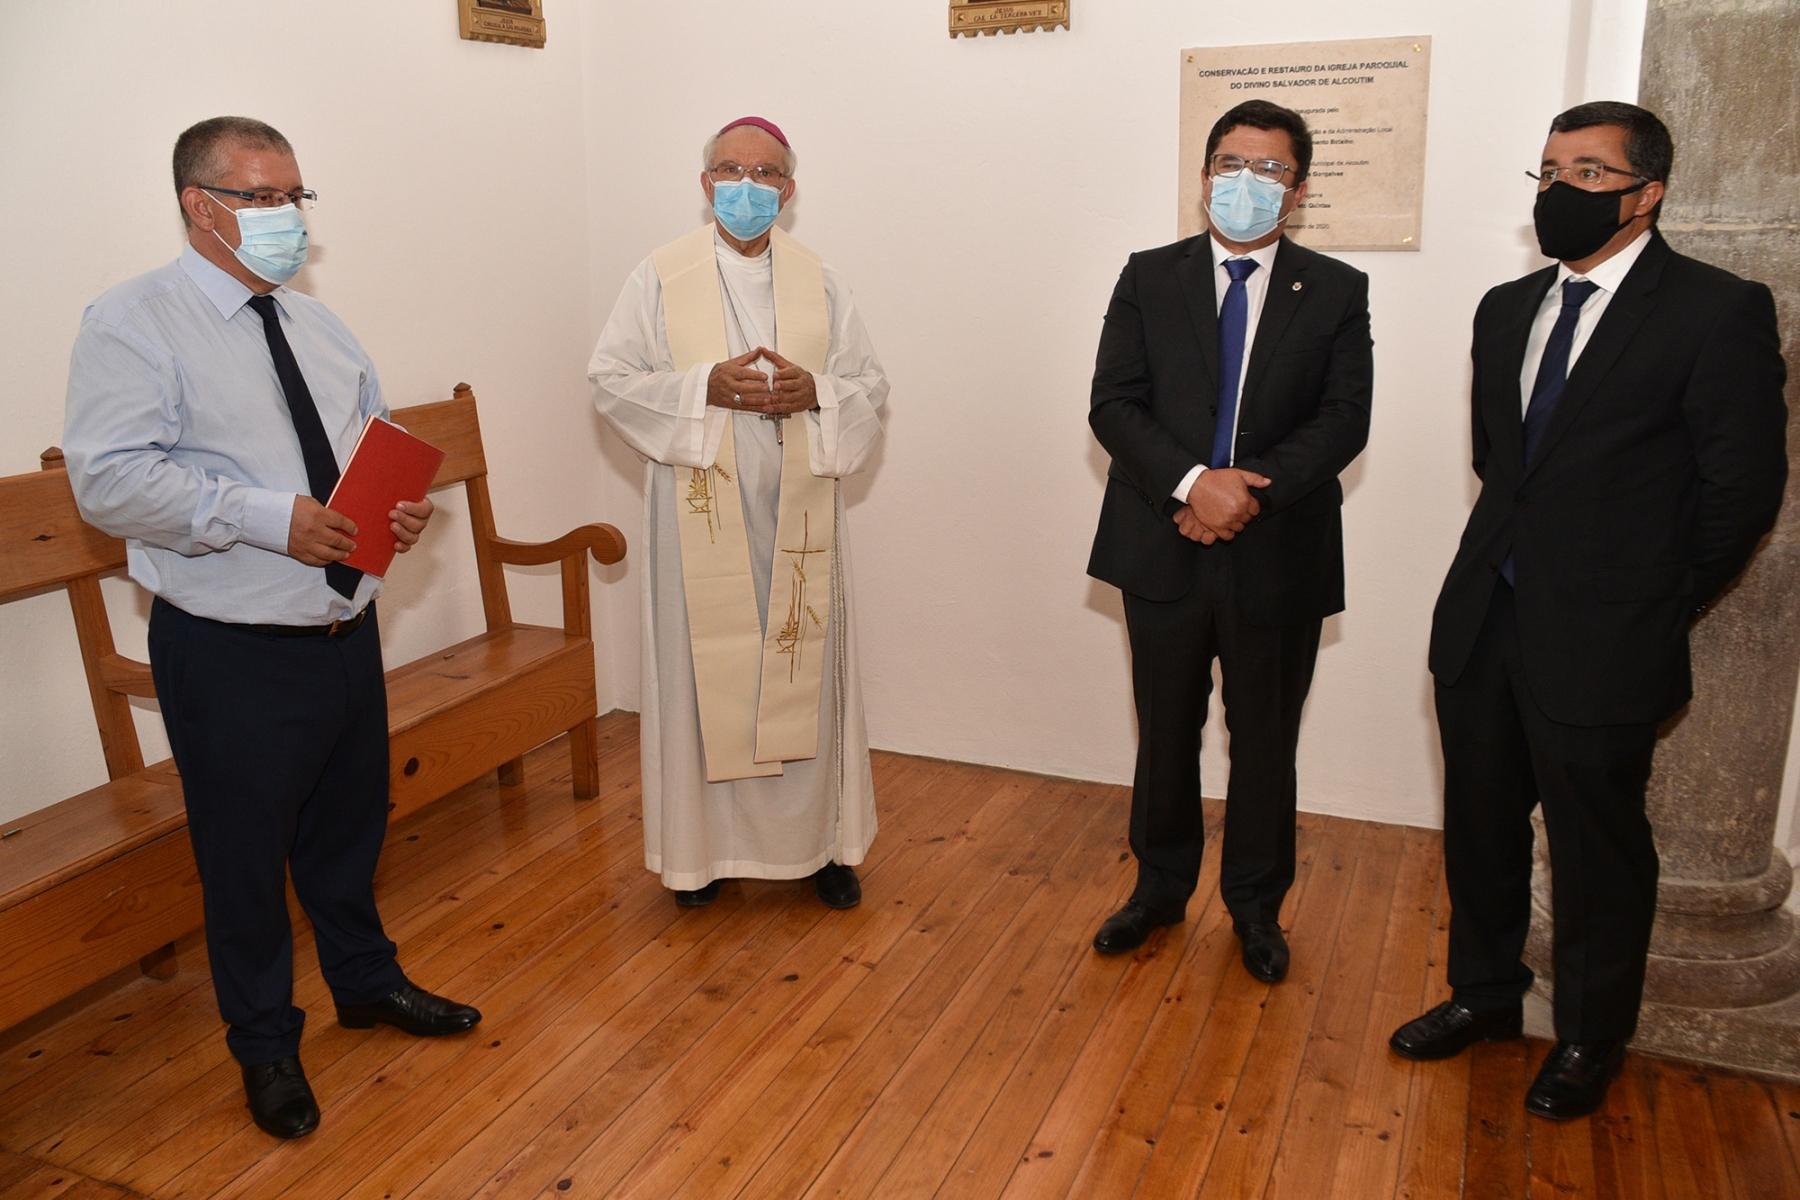 Inauguracao_bencao_obras_restauro_igreja_alcoutim-39